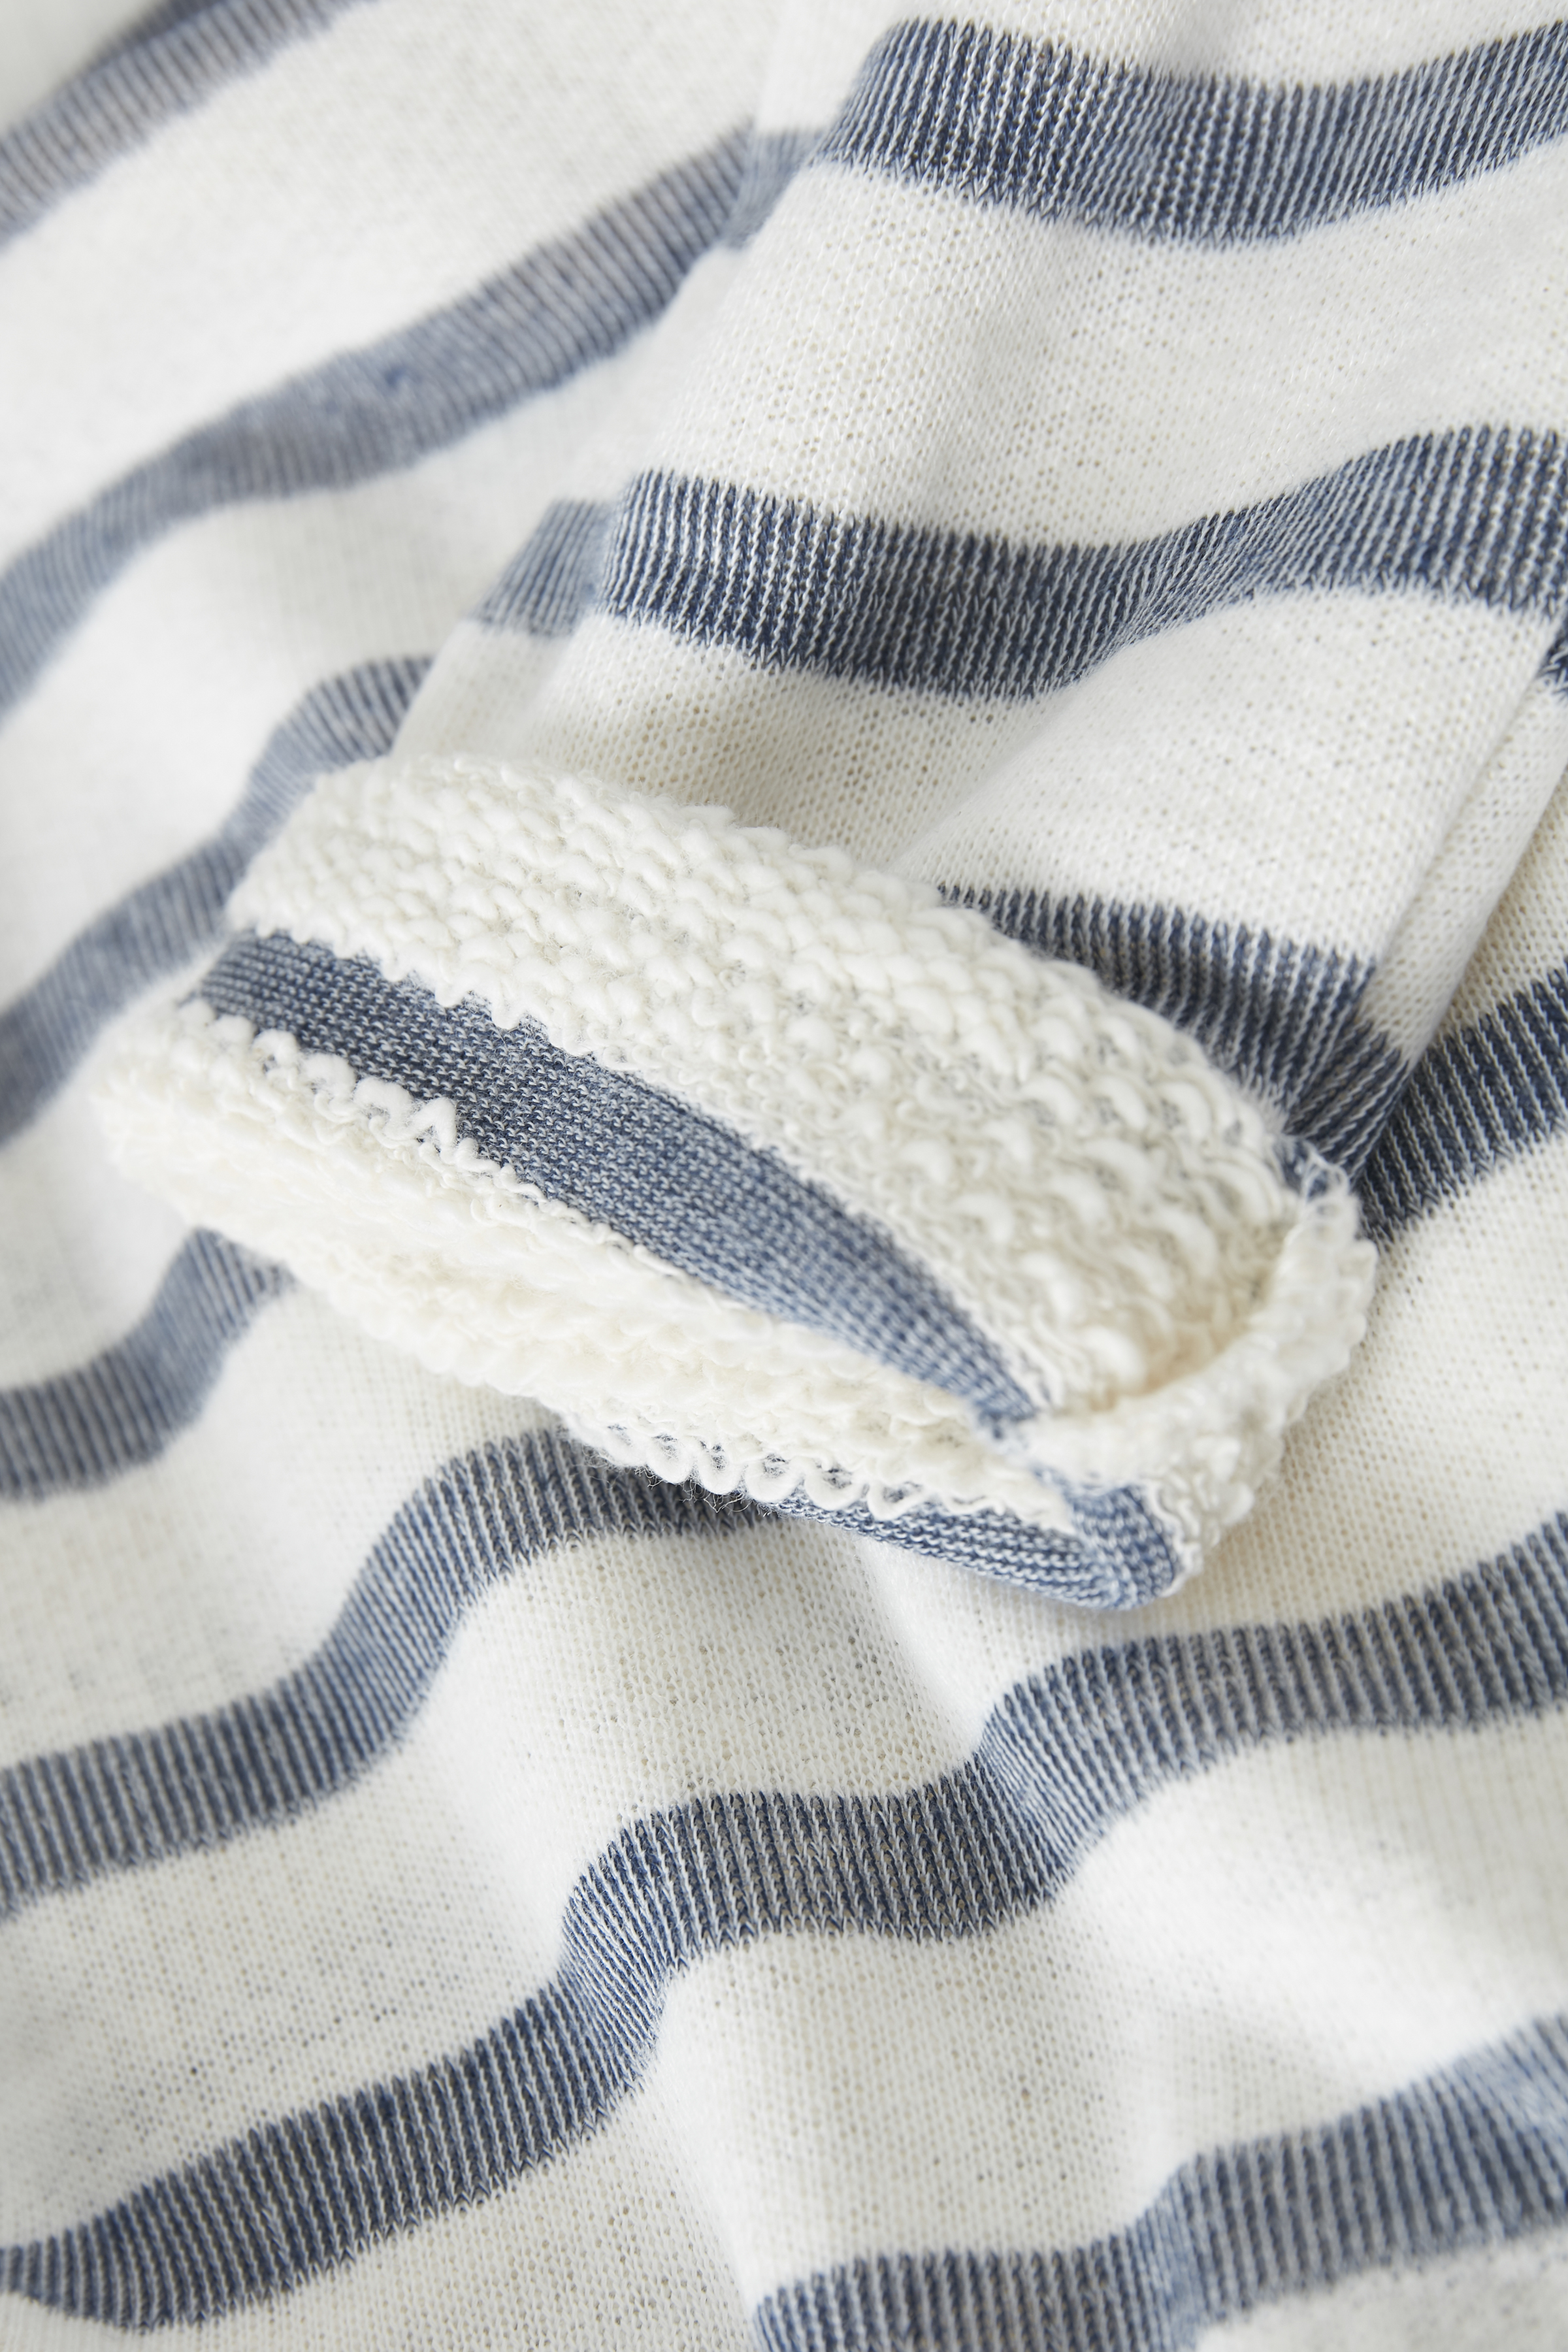 Off-white/marineblå Sweatshirt fra Bon'A Parte – Køb Off-white/marineblå Sweatshirt fra str. S-2XL her